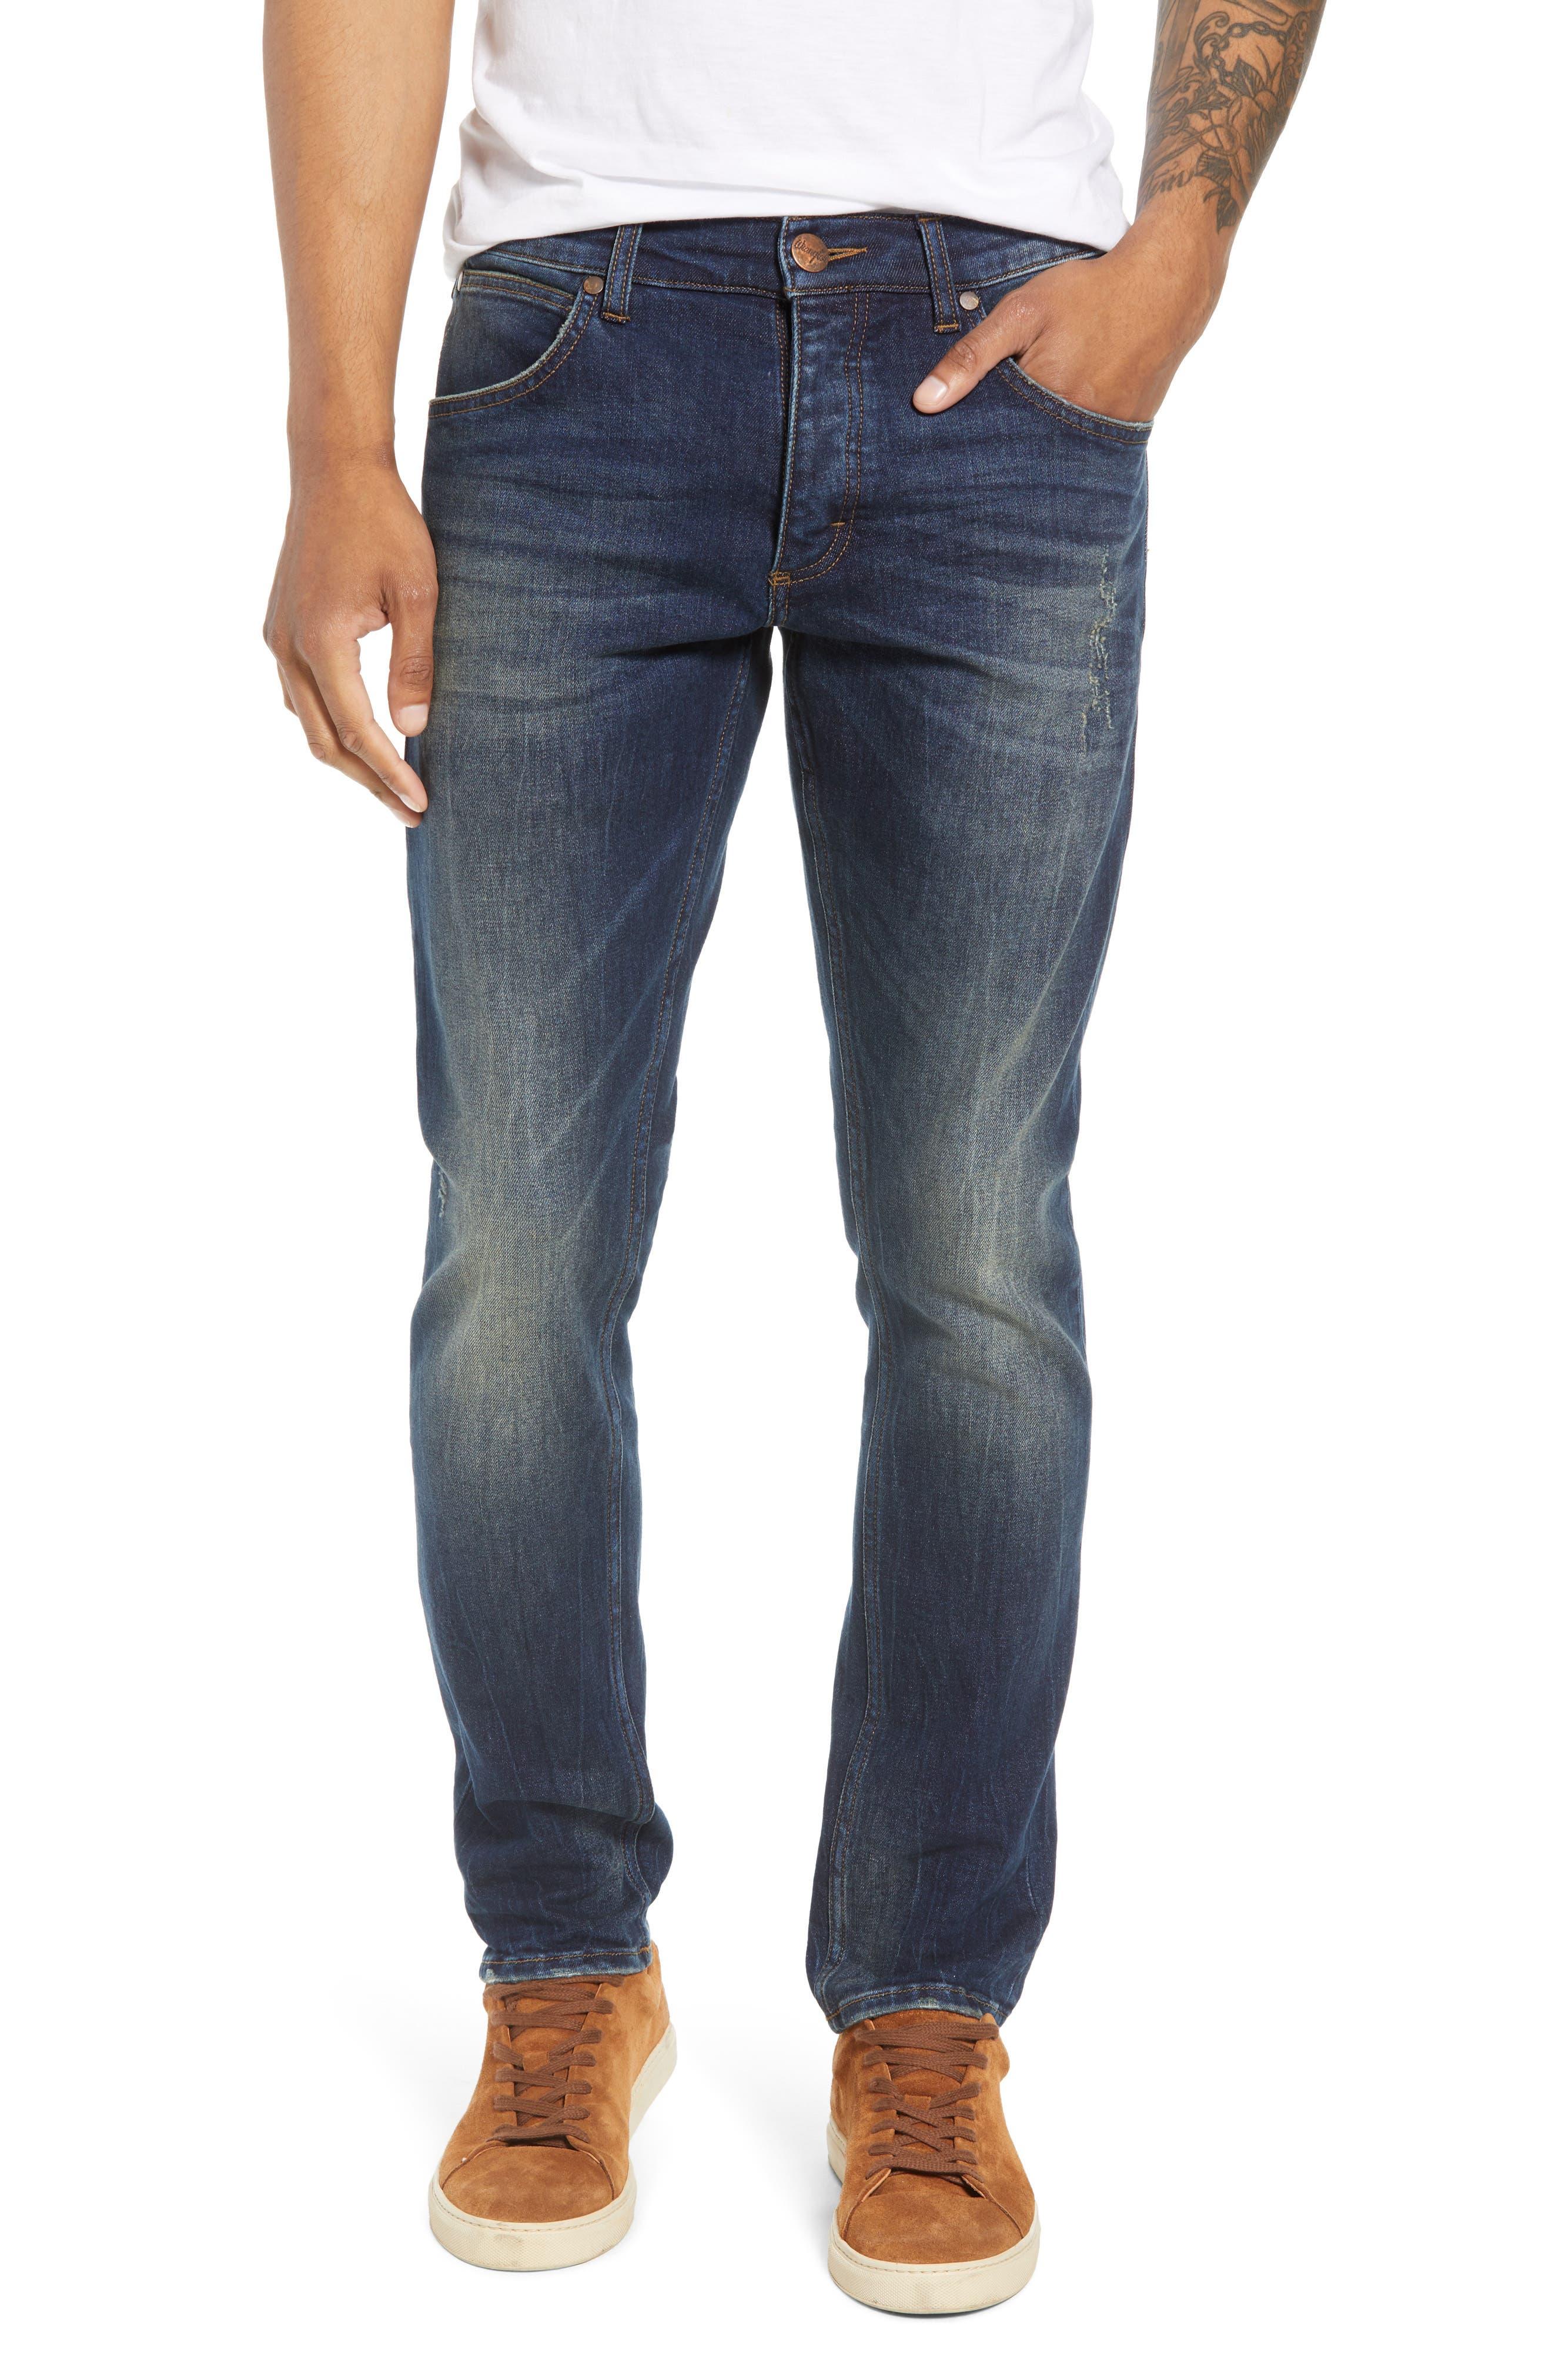 Larston Slim Fit Jeans,                         Main,                         color, VINTAGE DARK